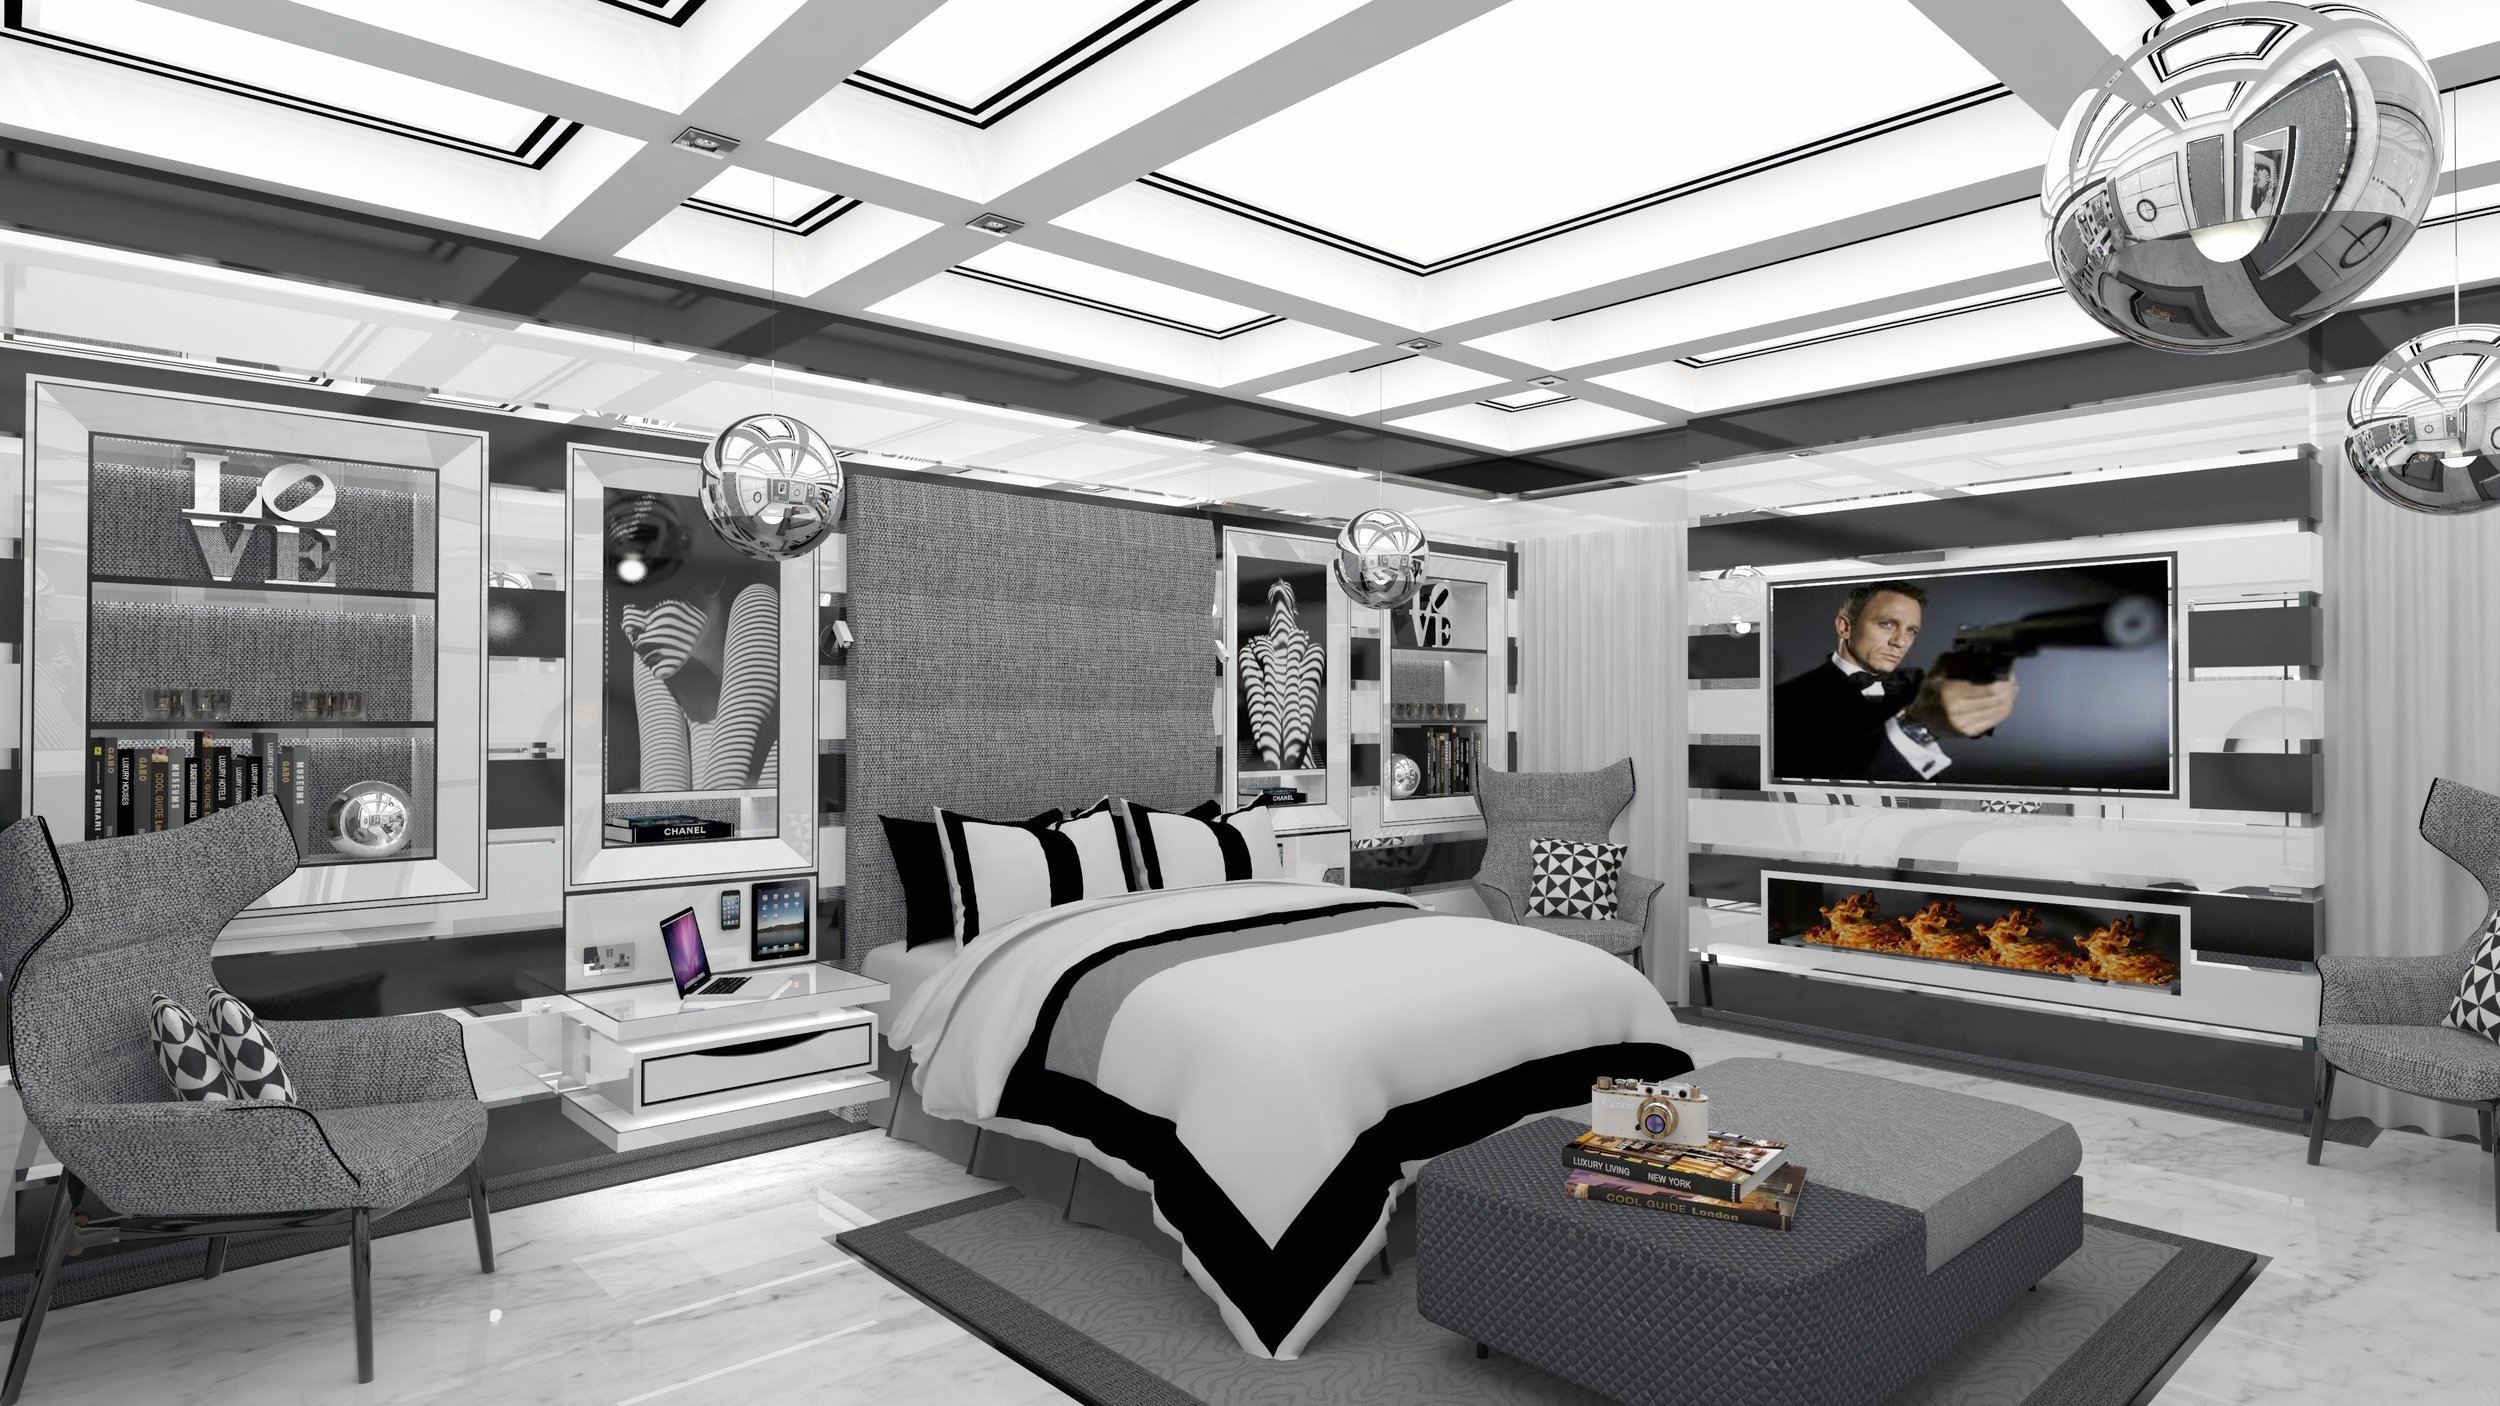 PIC 6 - ANGEL MARTIN - DESIGN PROCESS - BEDROOM RENDER.jpeg